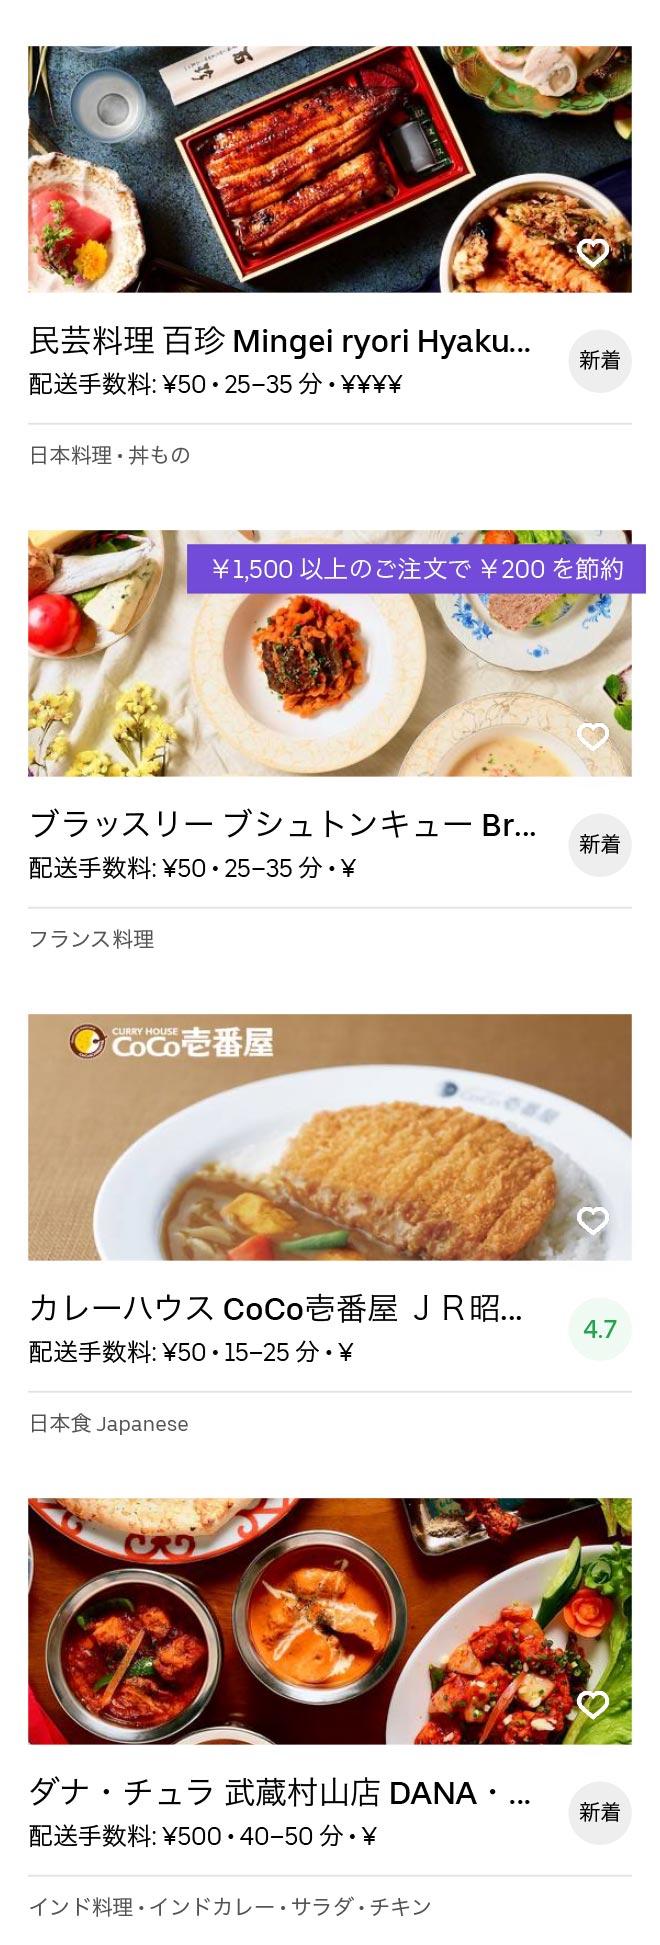 Akishima menu 2004 04